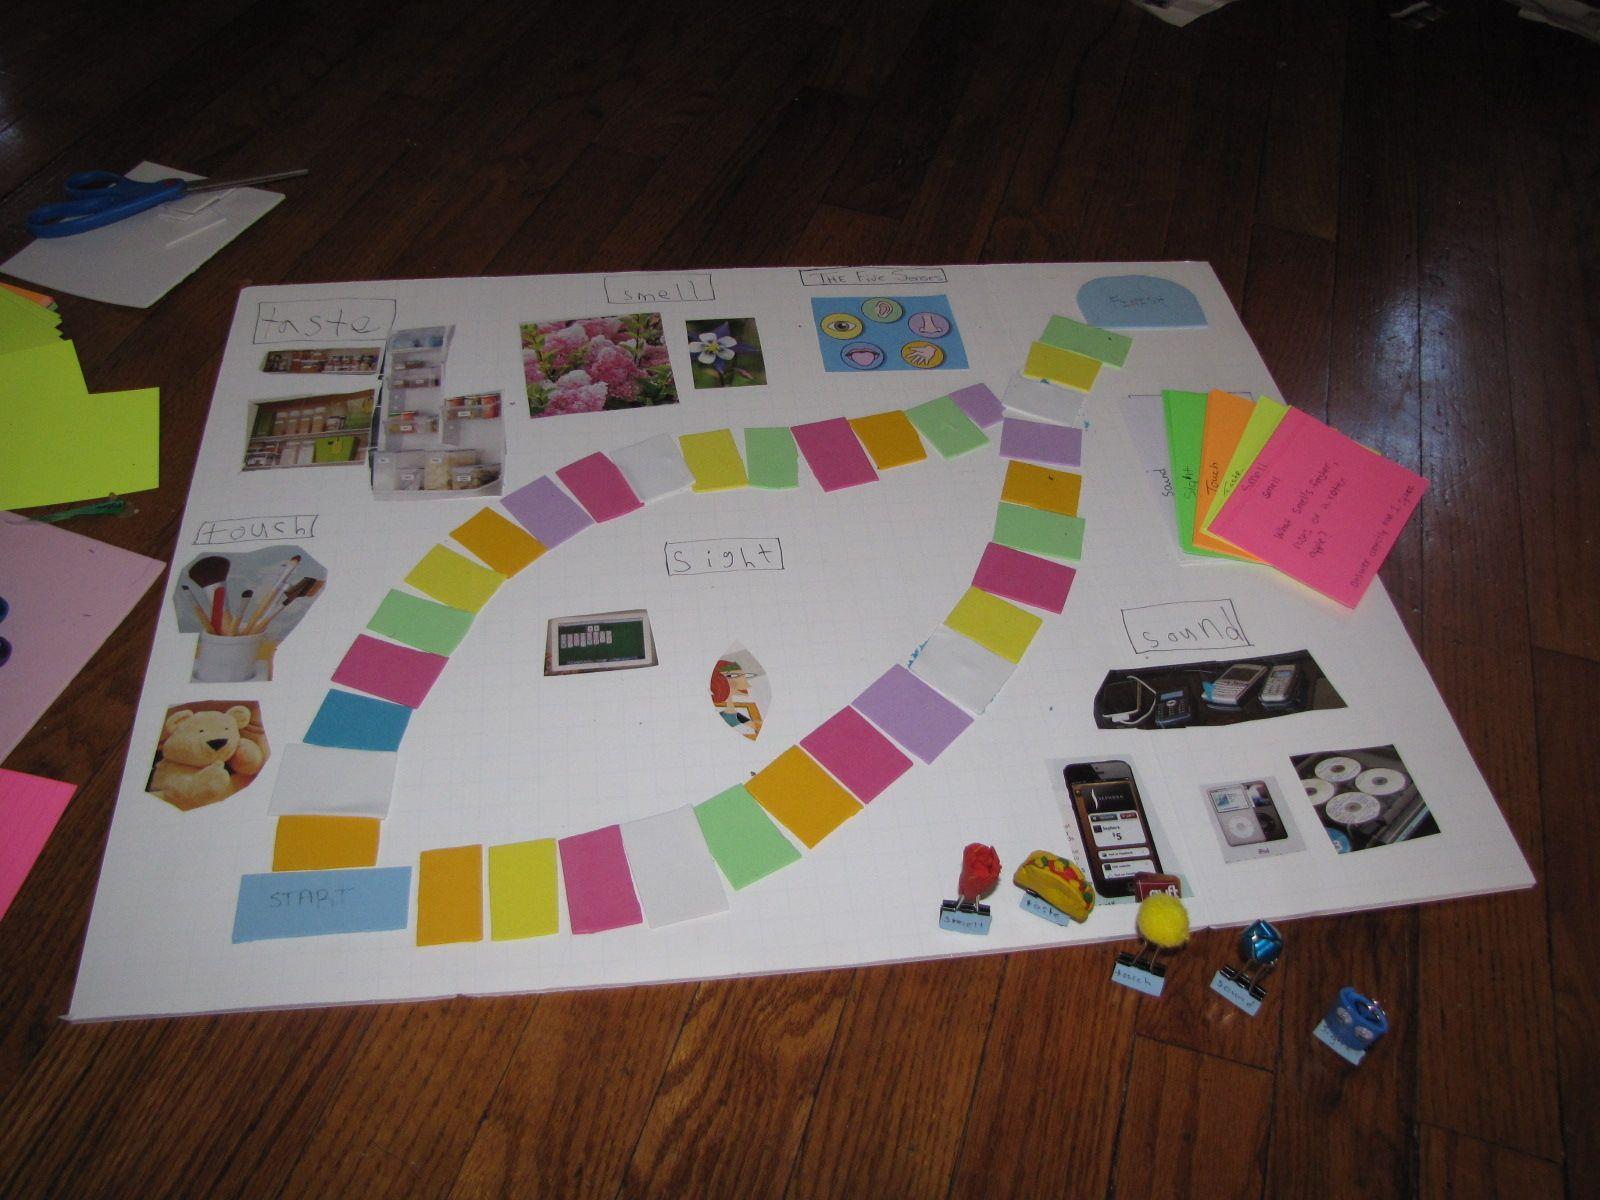 The 5 Senses Board Game School Project Ideas My Five Senses